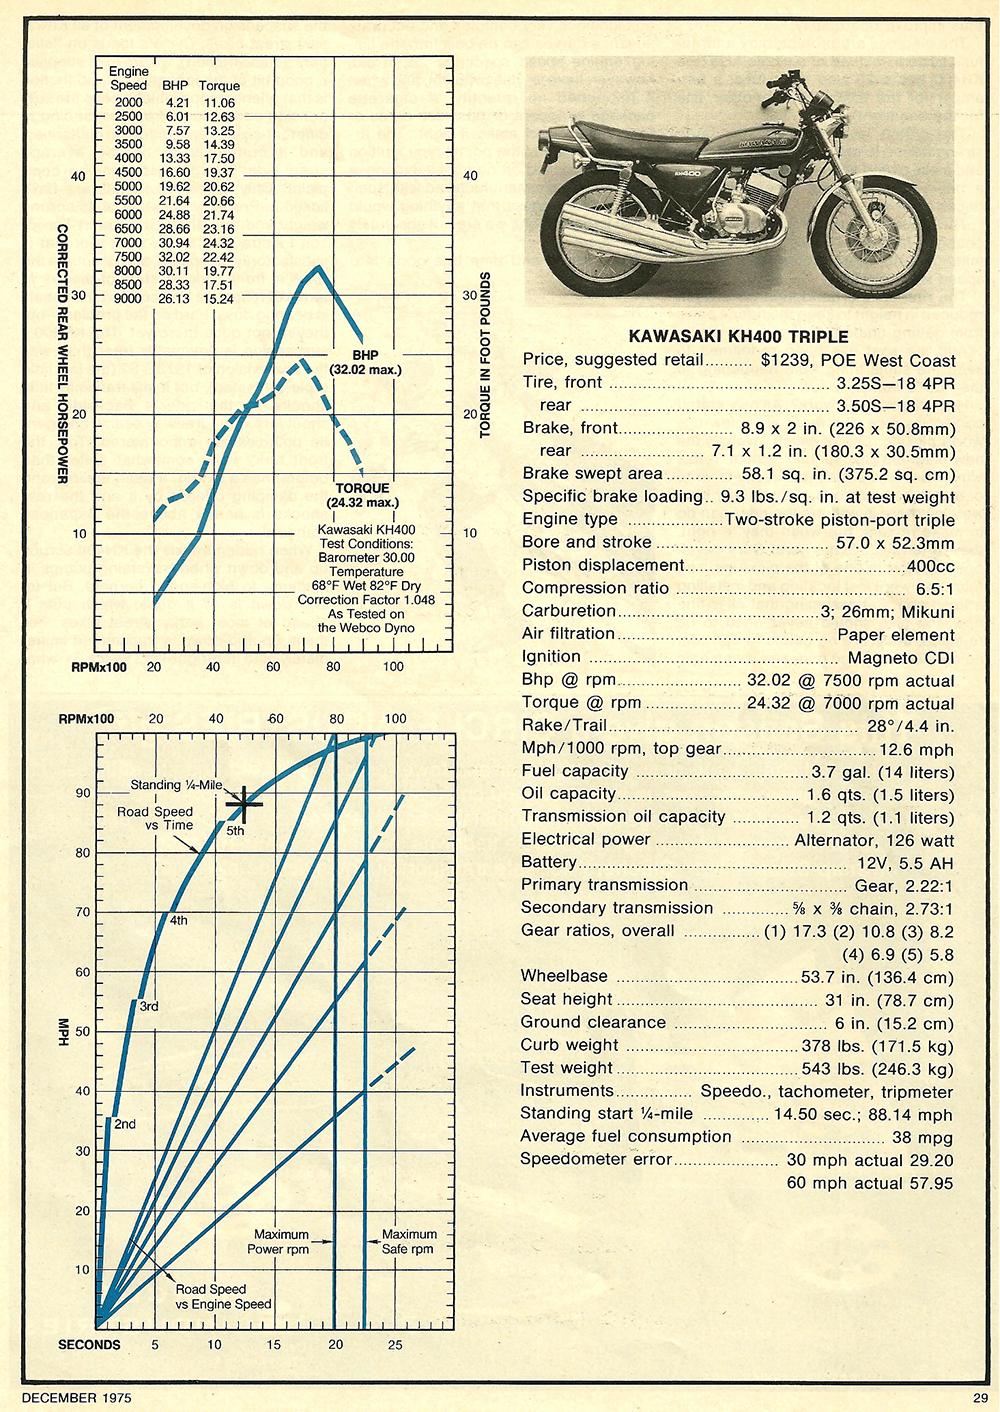 1976 Kawasaki KH400 road test 4.jpg